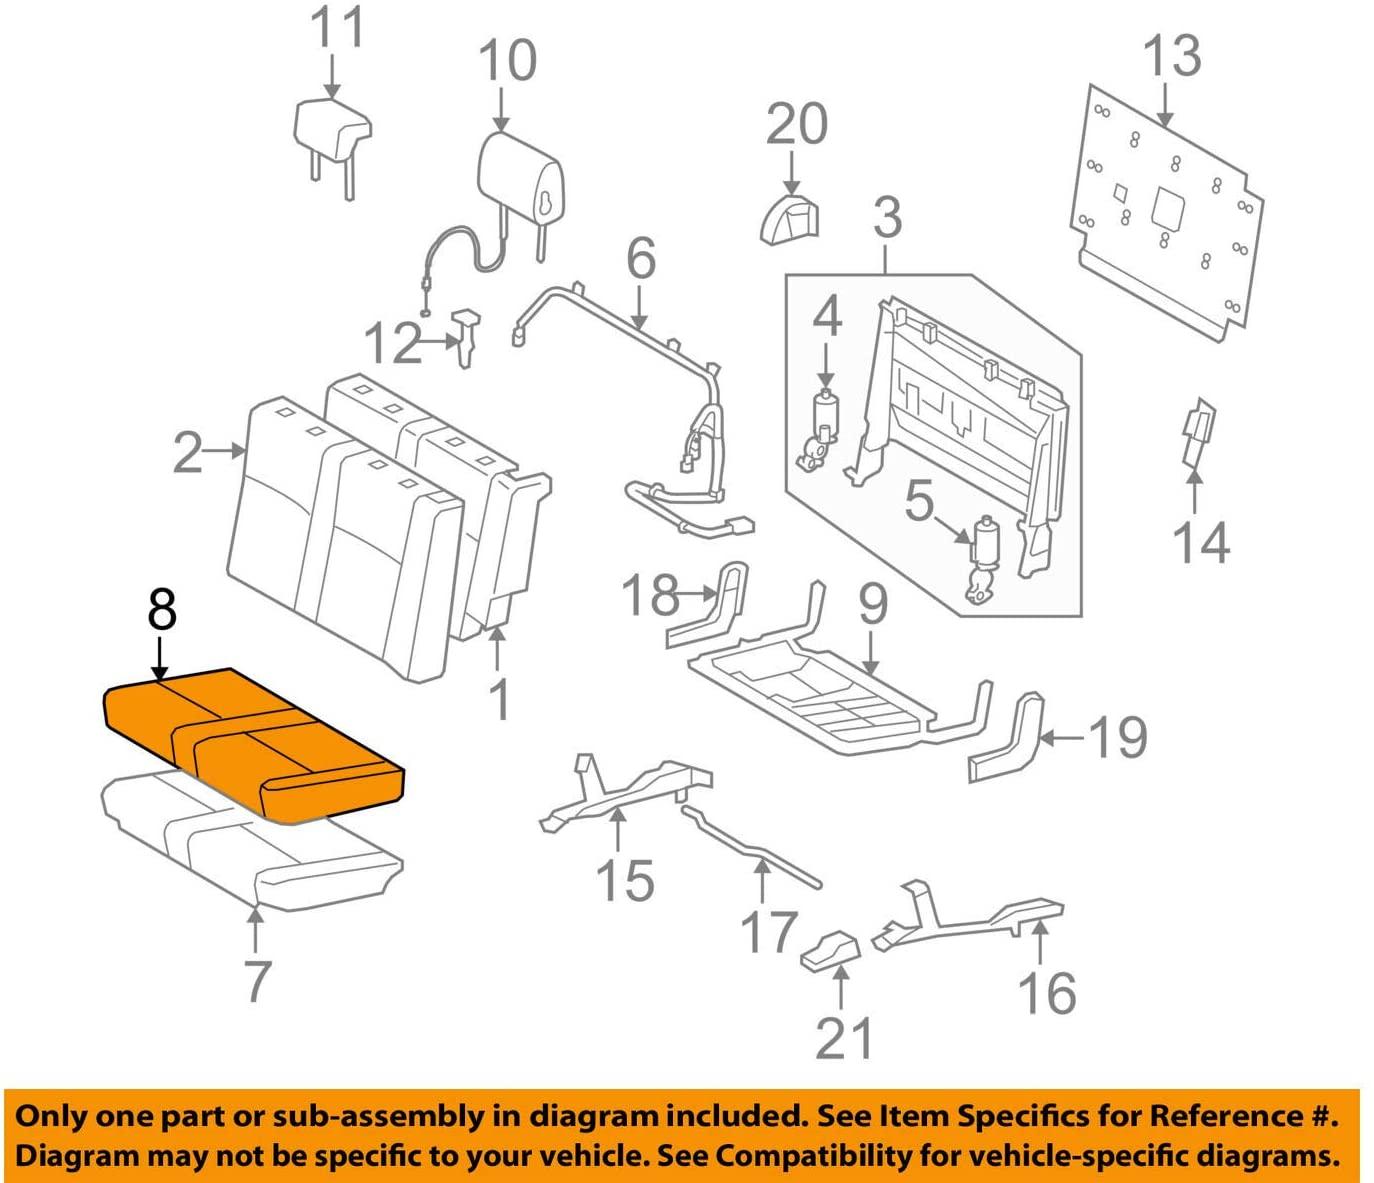 TOYOTA Genuine 79022-0C072-E7 Seat Cushion Cover Sub Assembly